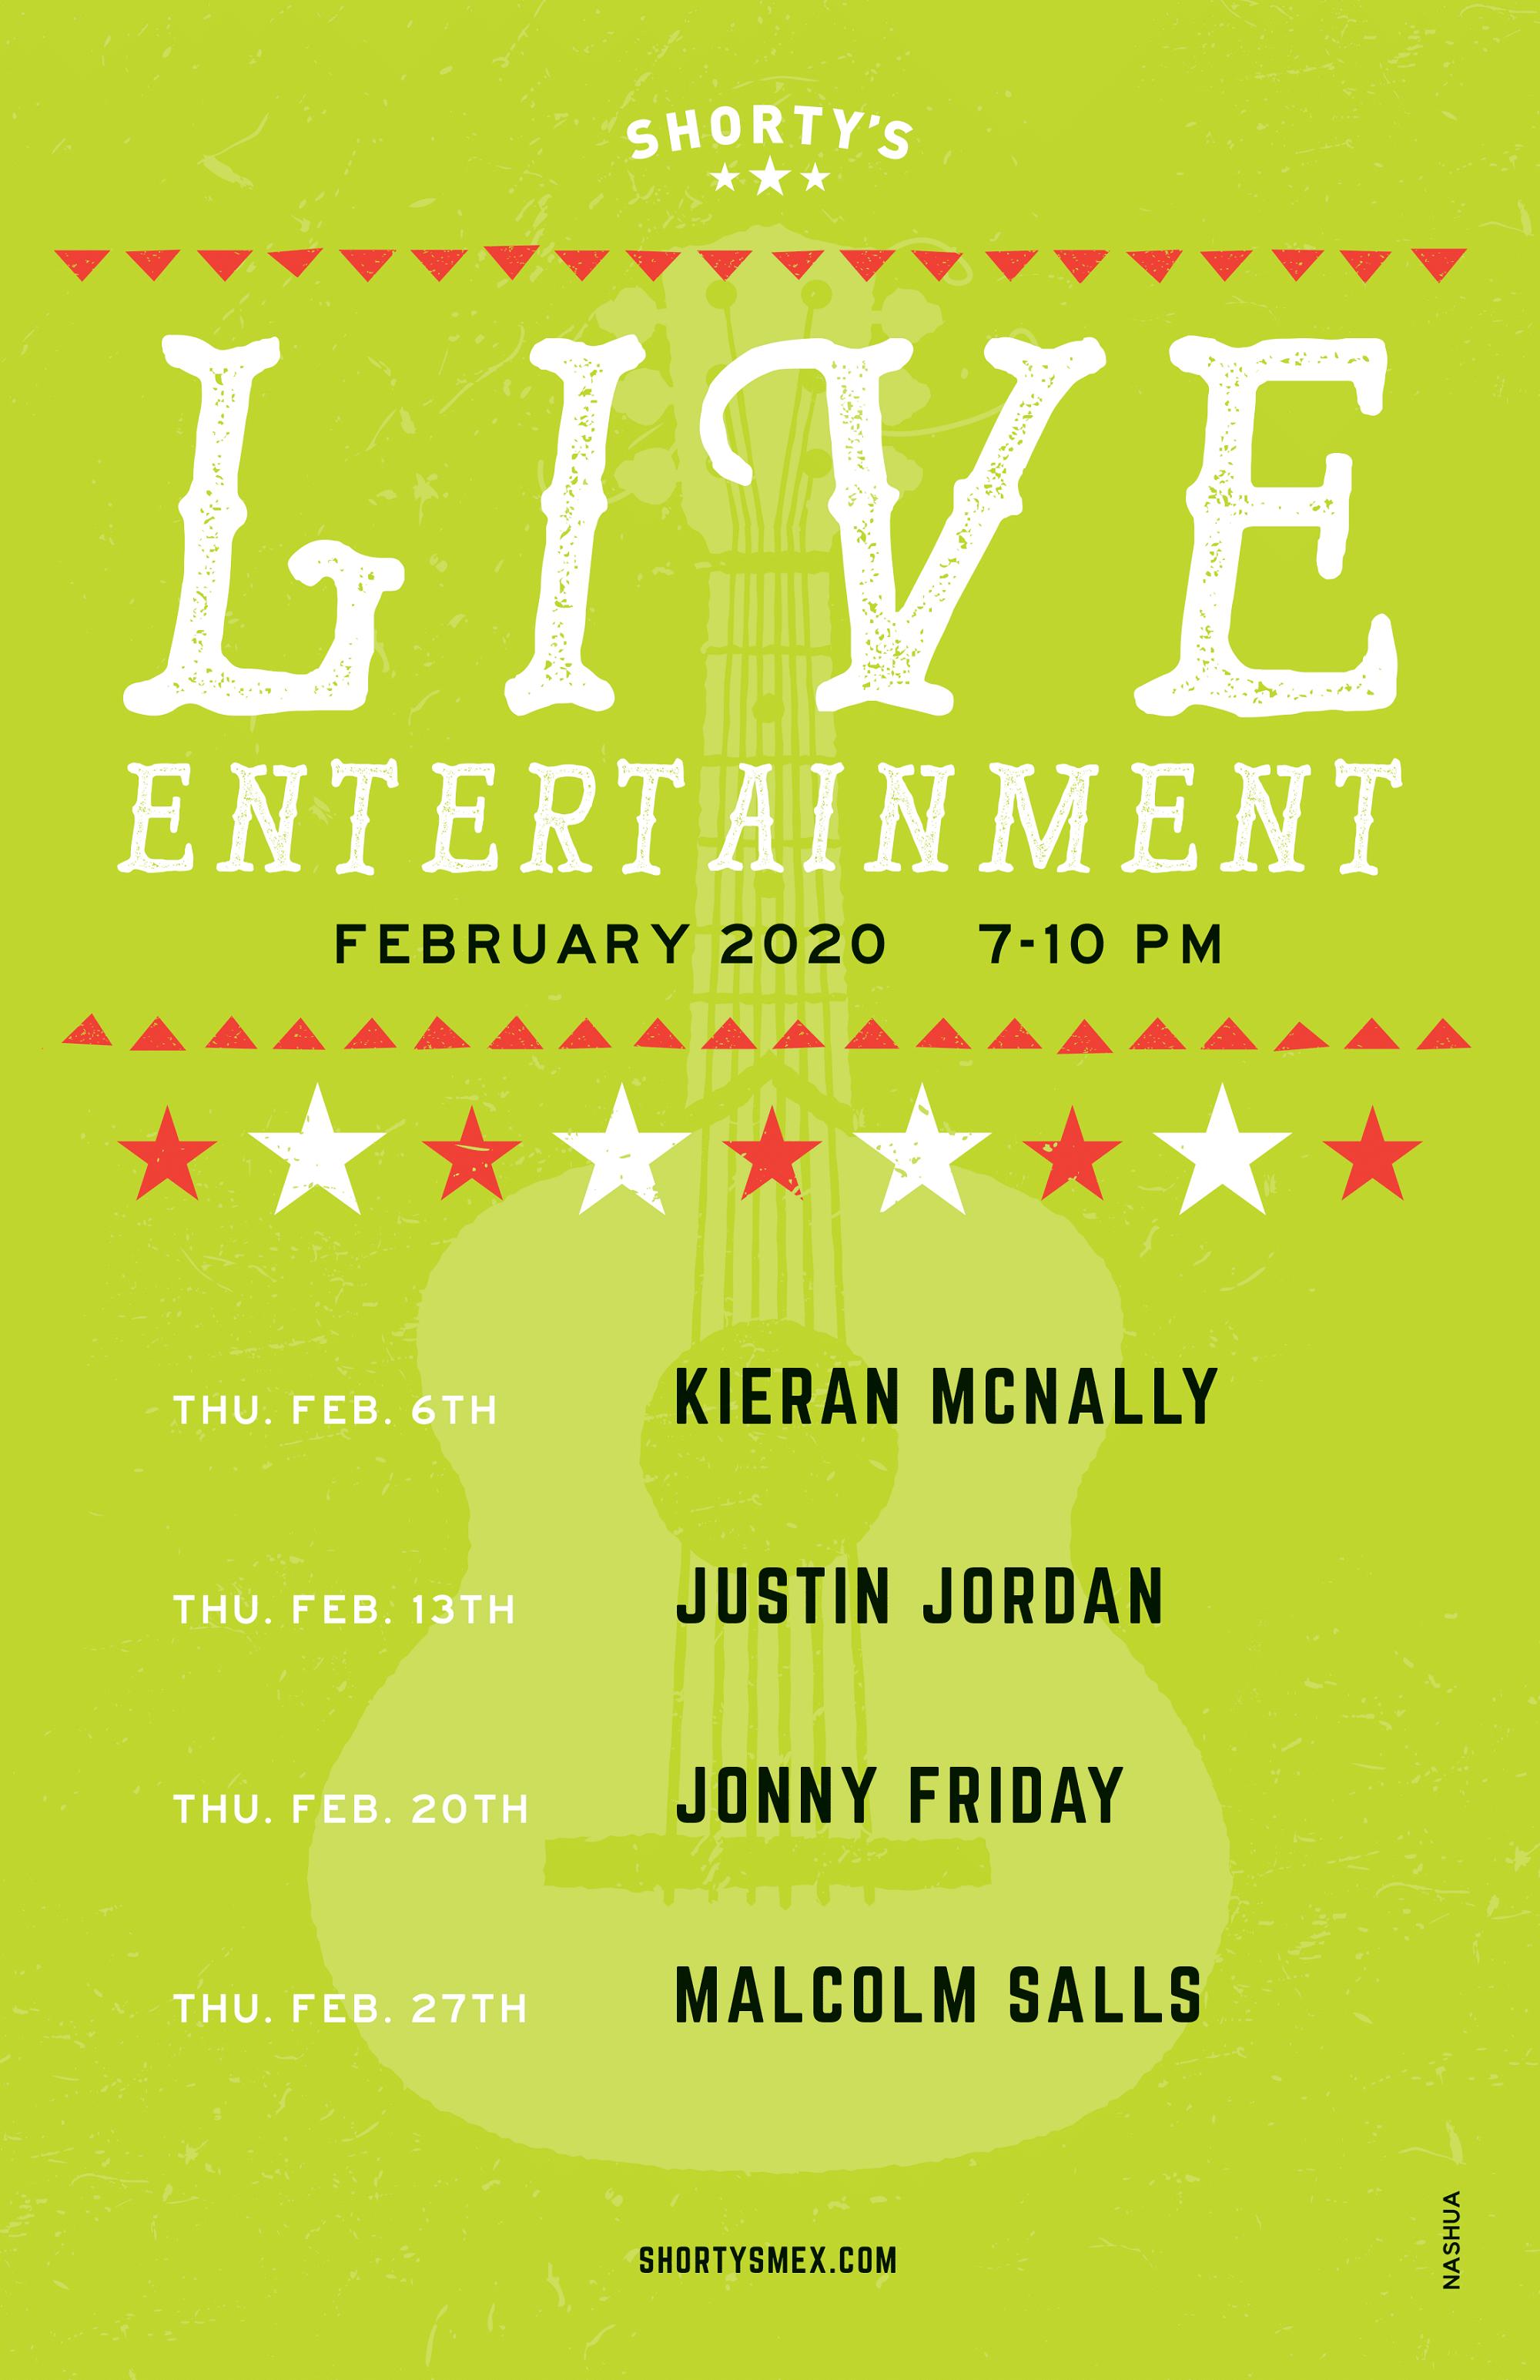 February Entertainment for Shorty's Nashua